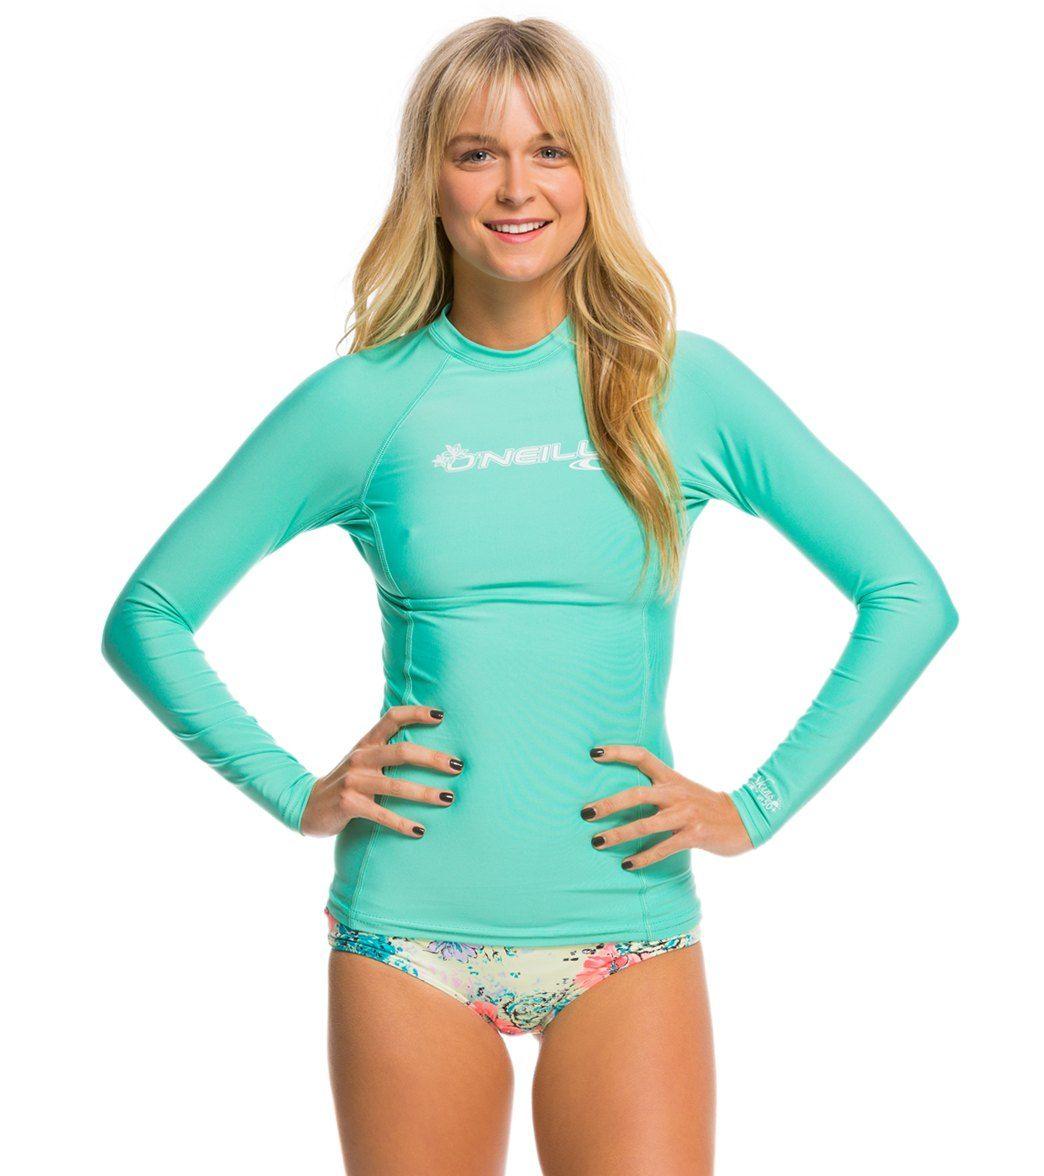 0e69a4bd1f O Neill Women s Basic Skins Long Sleeve Crew Rashguard at SwimOutlet.com -  The Web s most popular swim shop